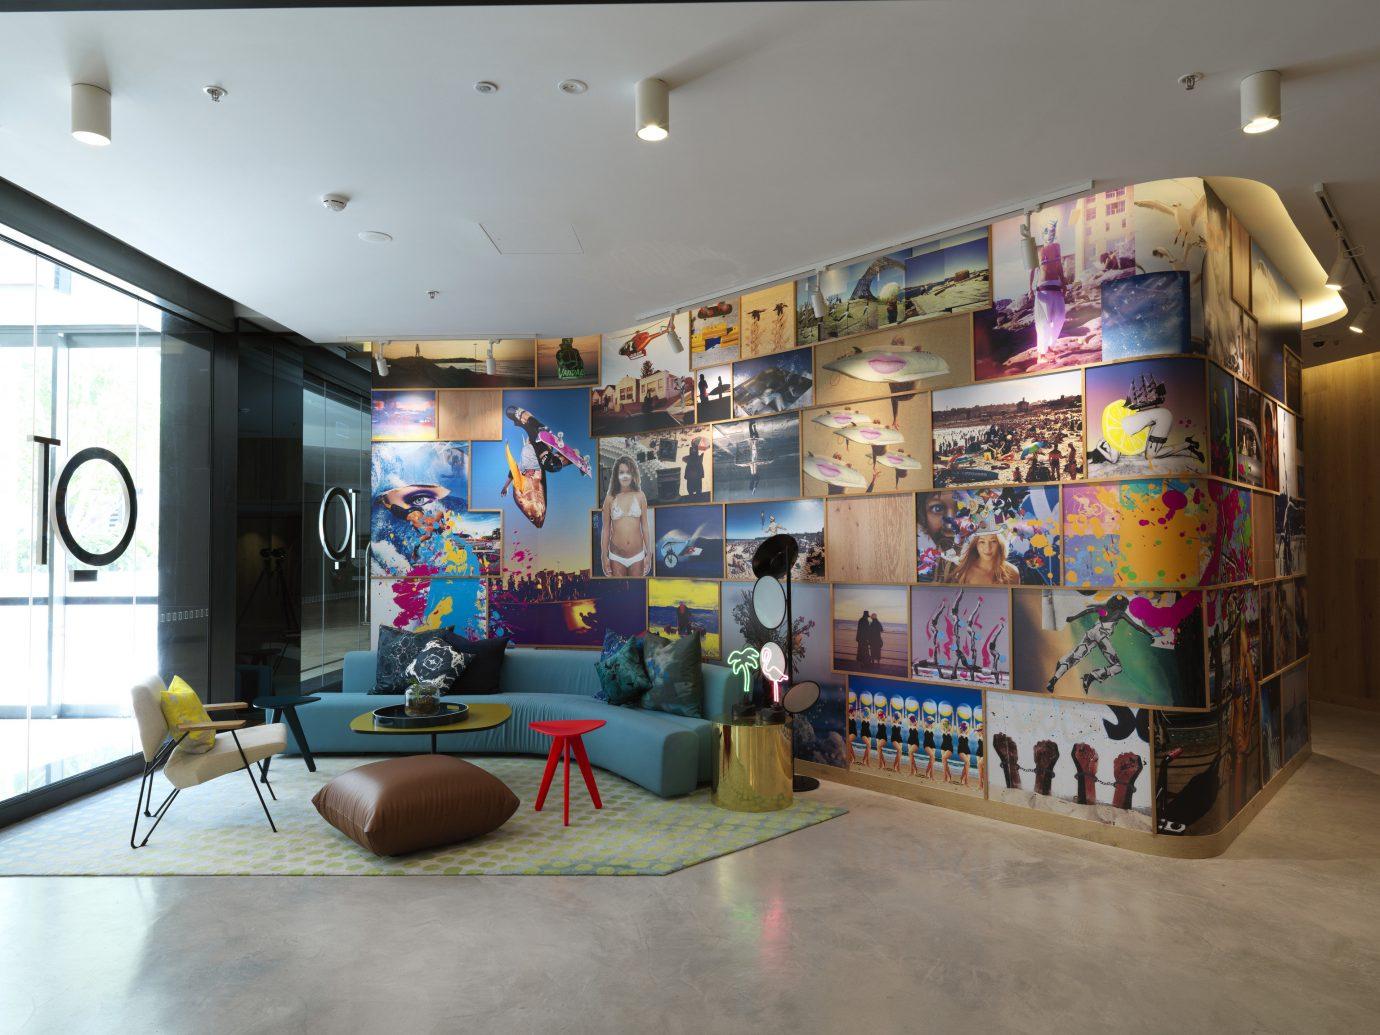 Hotels indoor floor room ceiling art mural interior design tourist attraction decorated